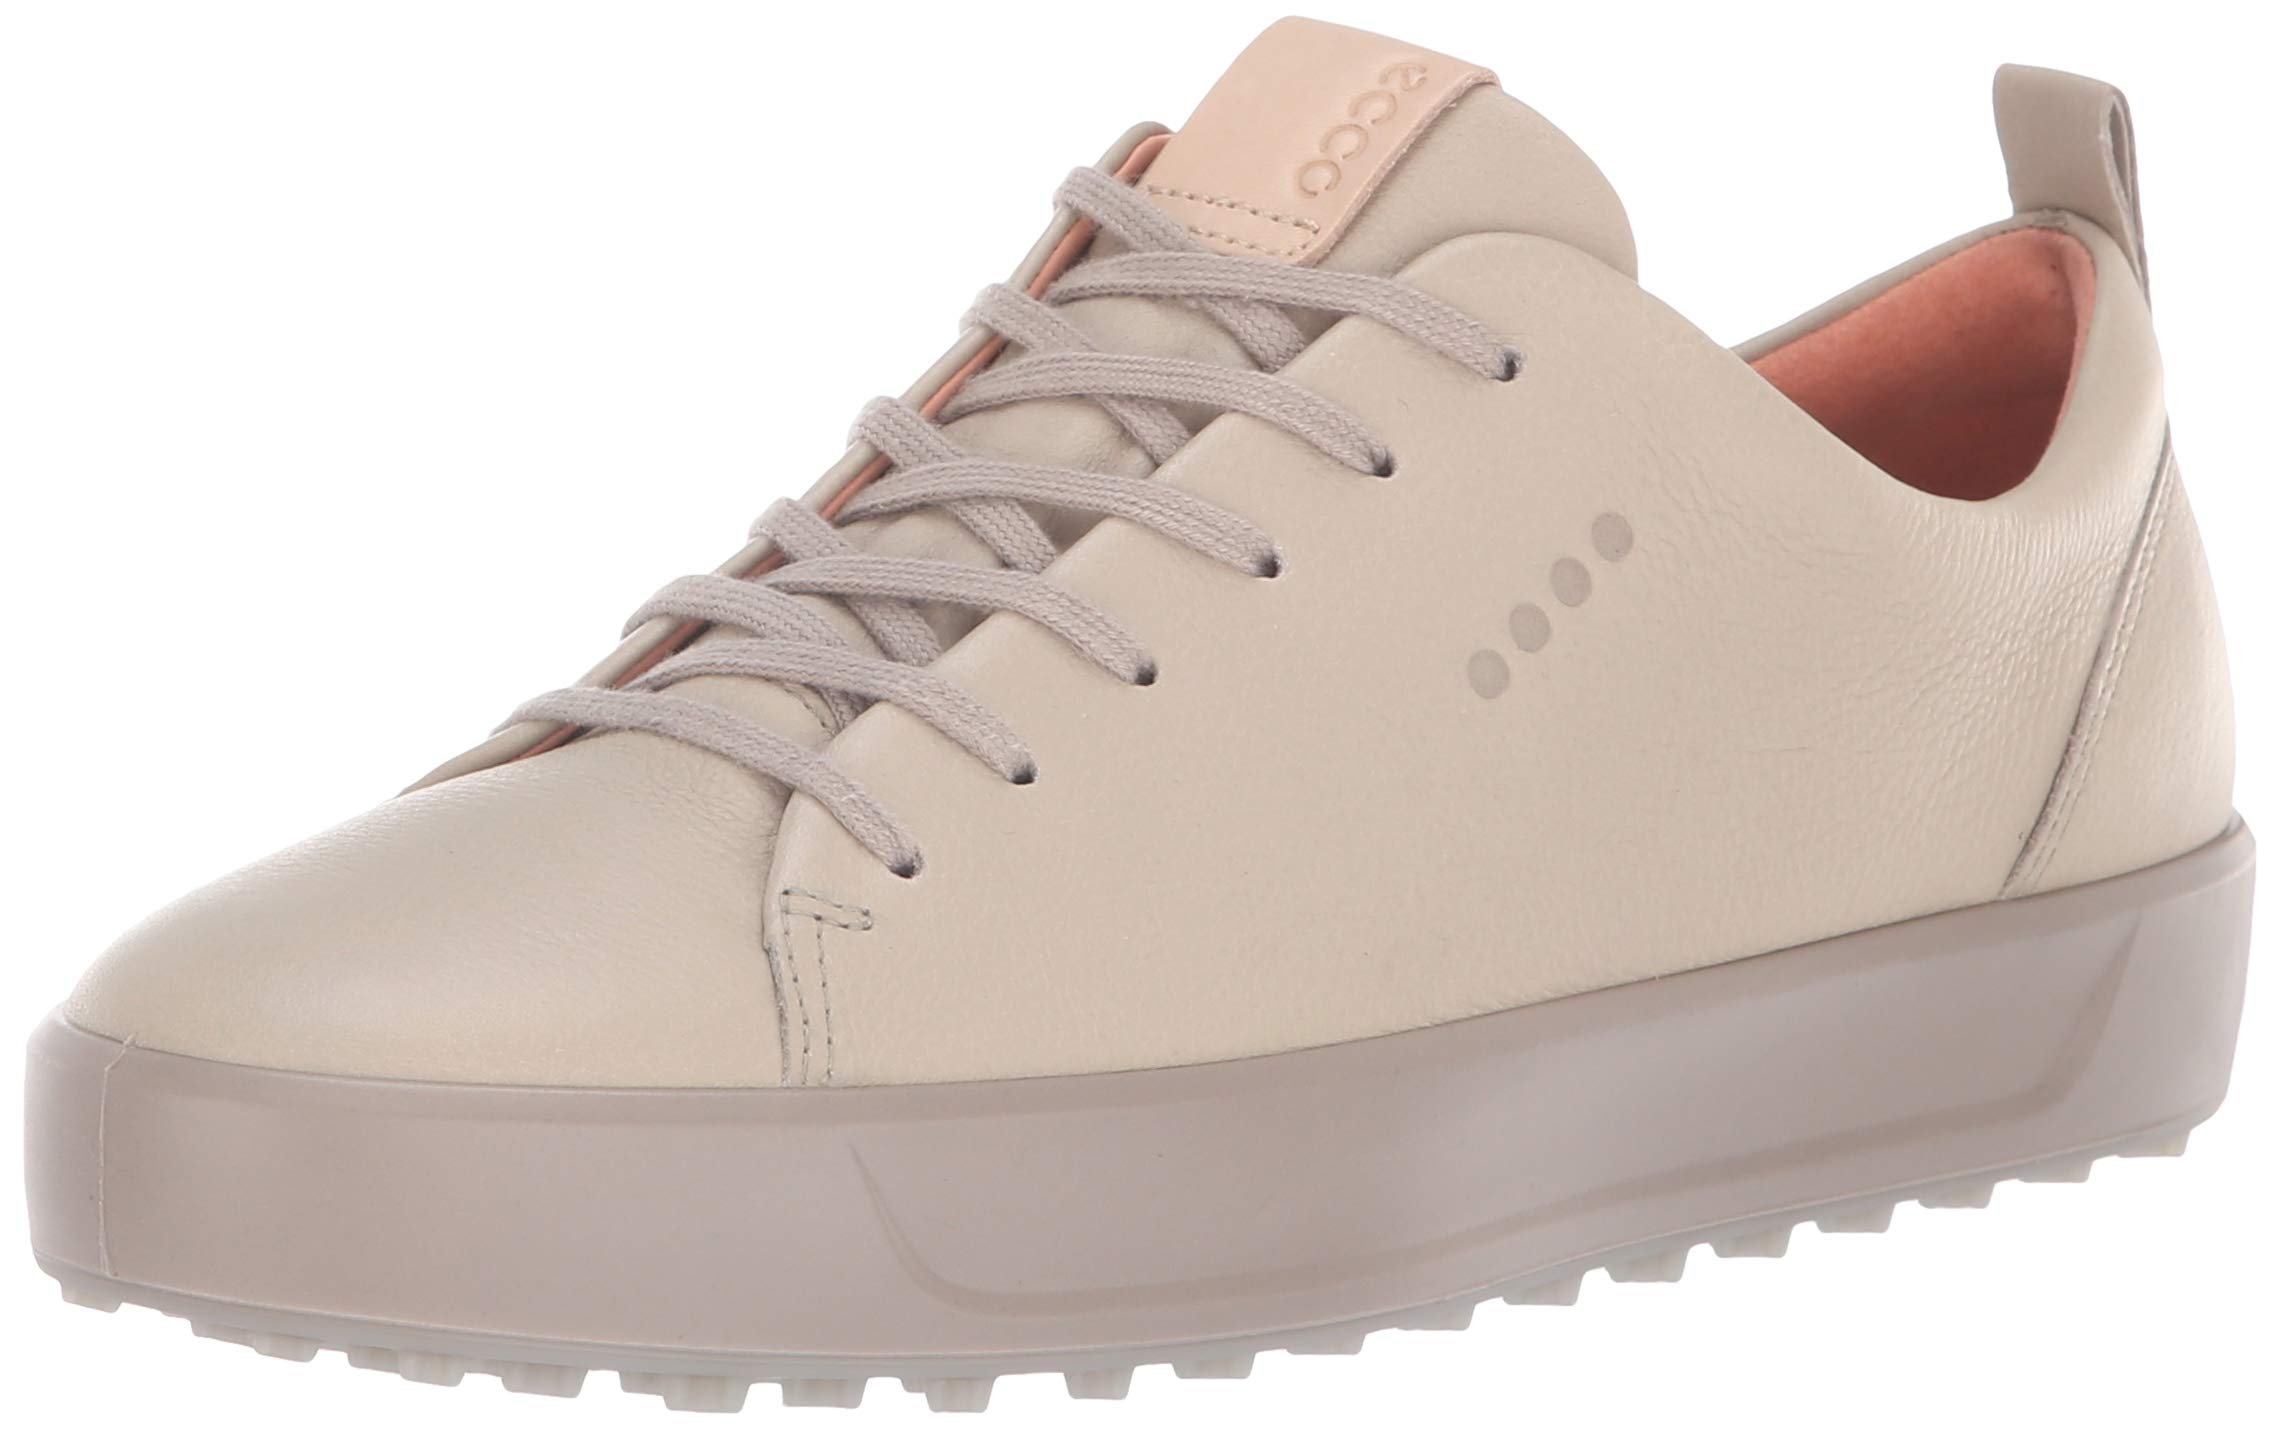 ECCO Women's Soft Low Hydromax Golf Shoe, oyester, 36 M EU (5-5.5 US)